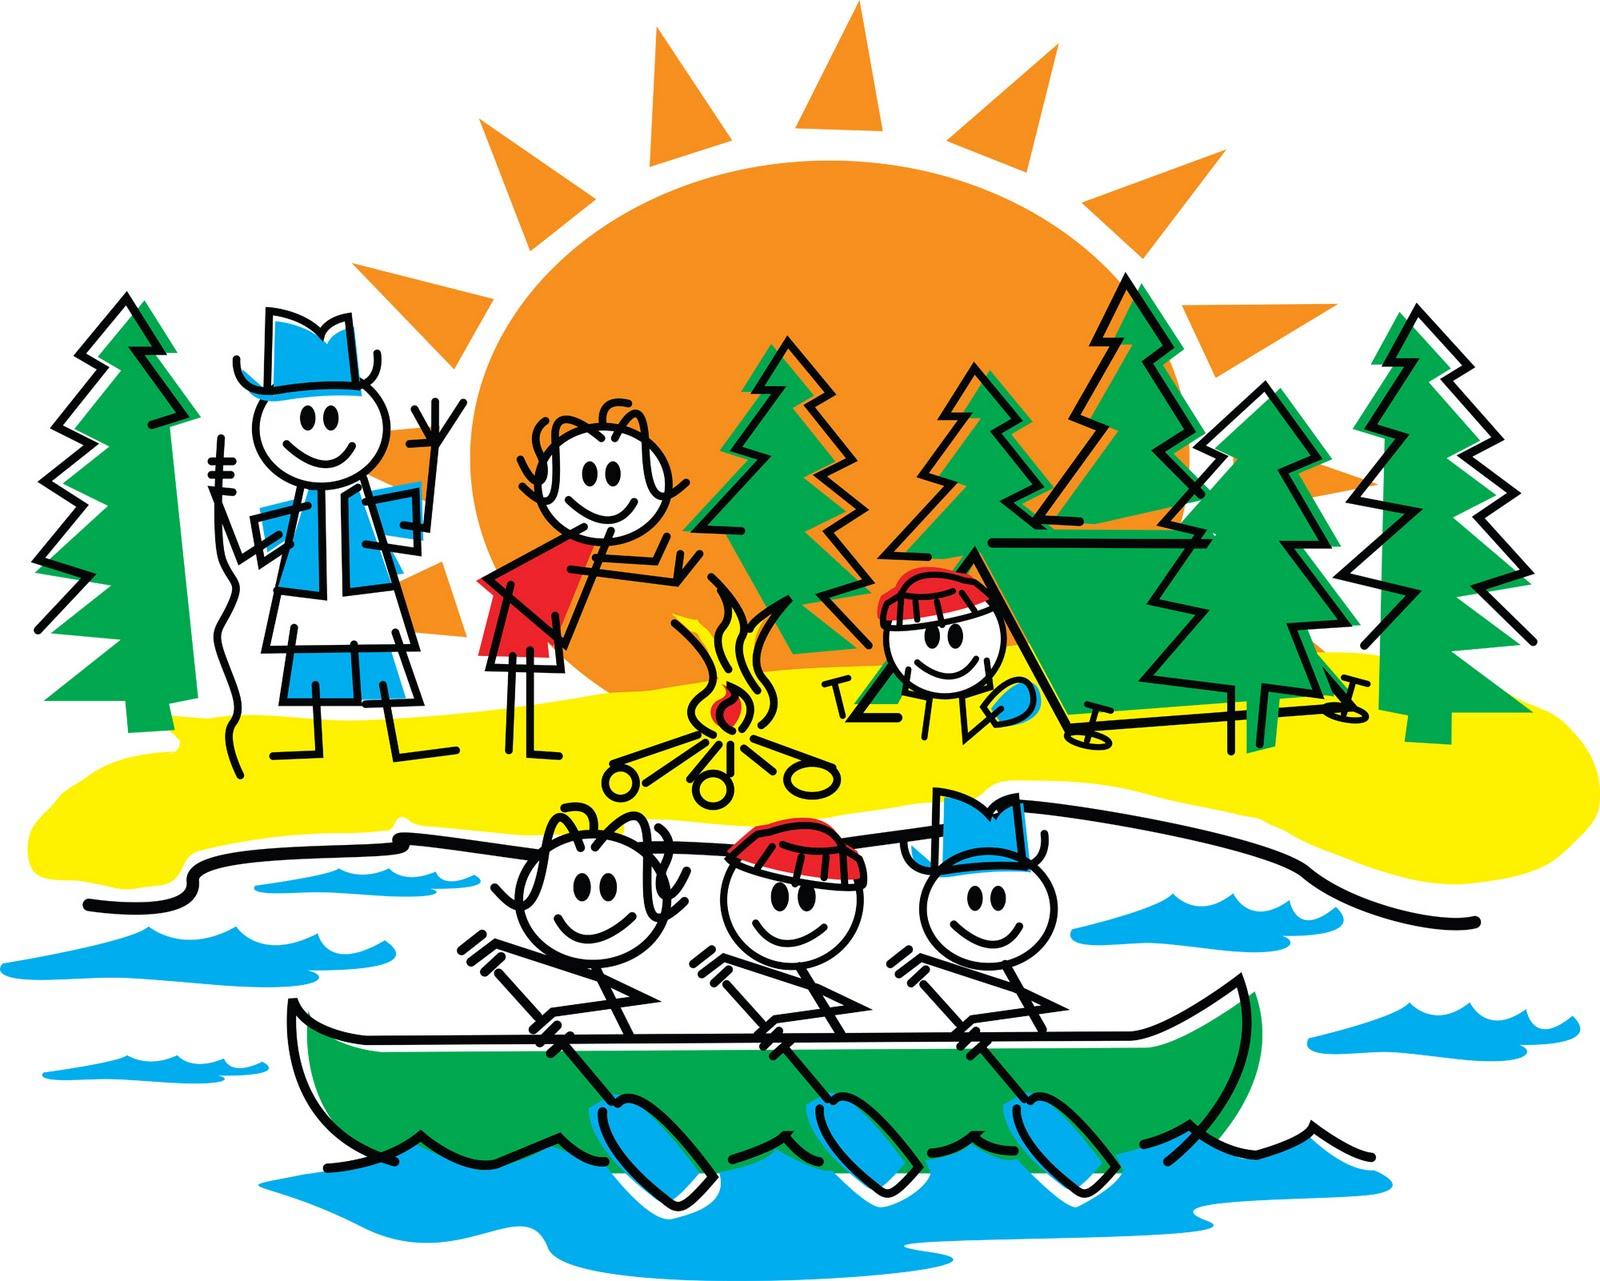 Day Camp Cartoon Clipart.